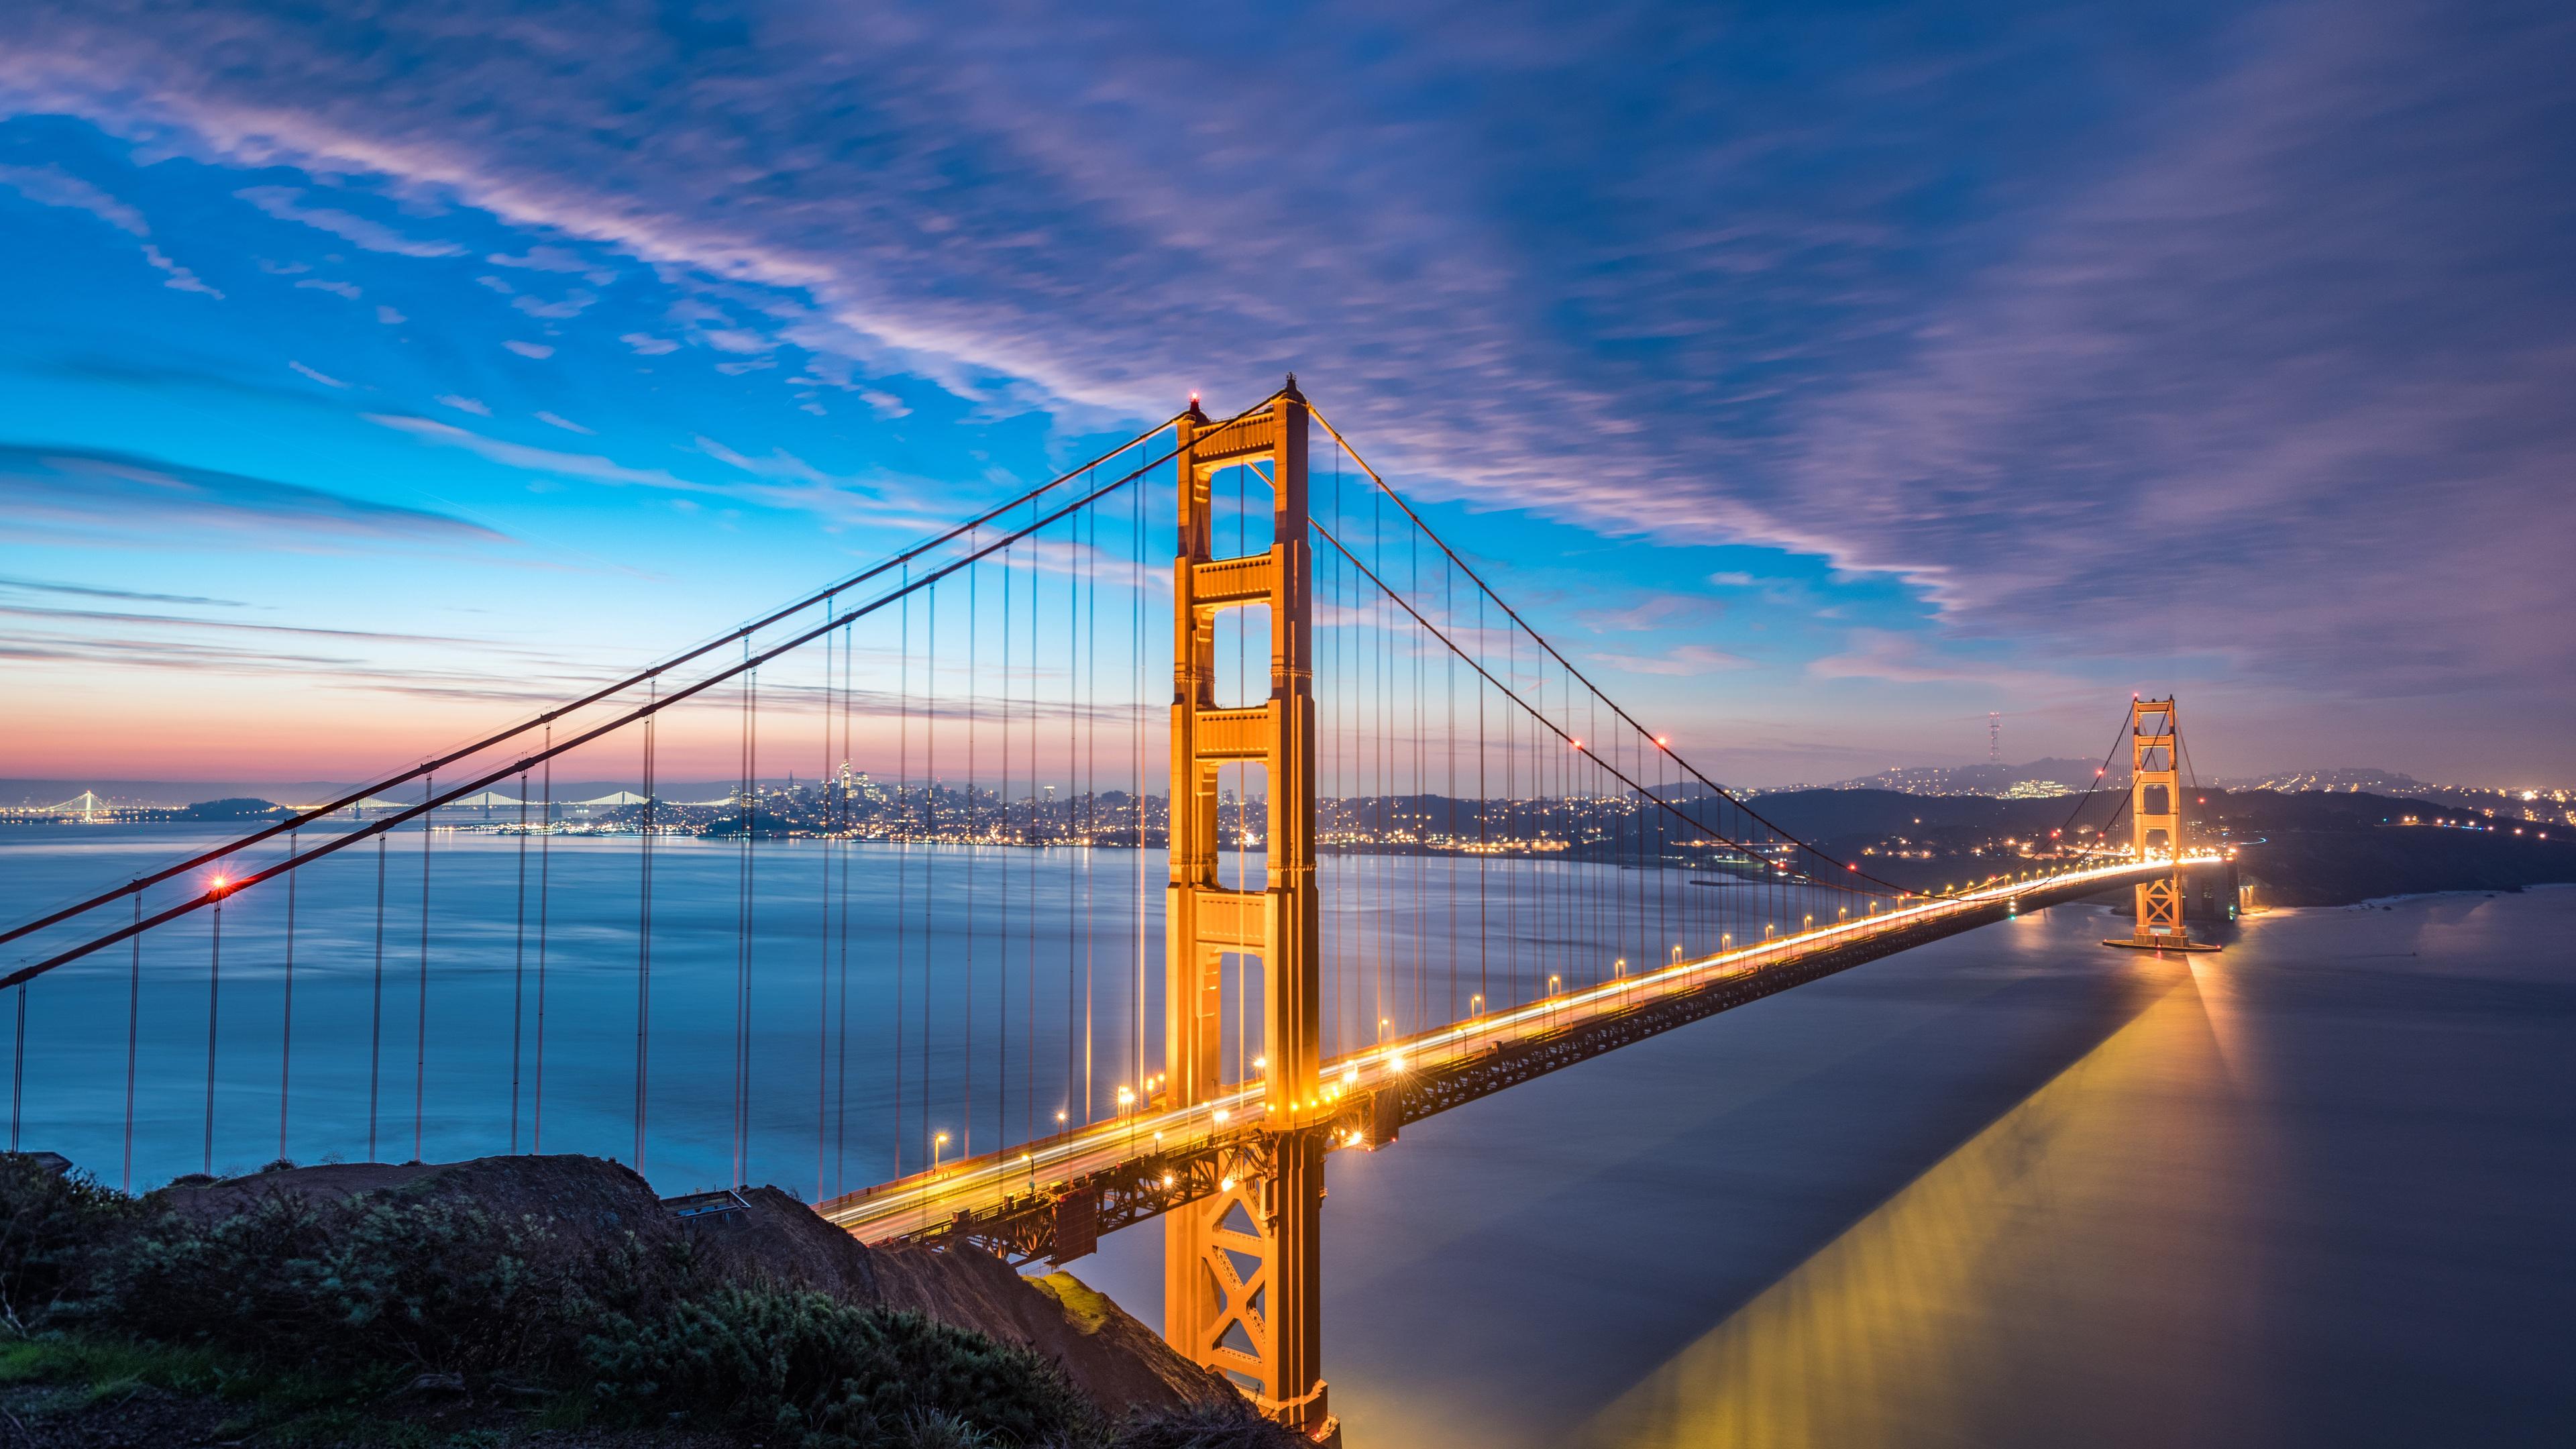 golden gate bridge 8k 1538072088 - Golden Gate Bridge 8k - world wallpapers, san francisco wallpapers, hd-wallpapers, golden gate bridge wallpapers, bridge wallpapers, 8k wallpapers, 5k wallpapers, 4k-wallpapers